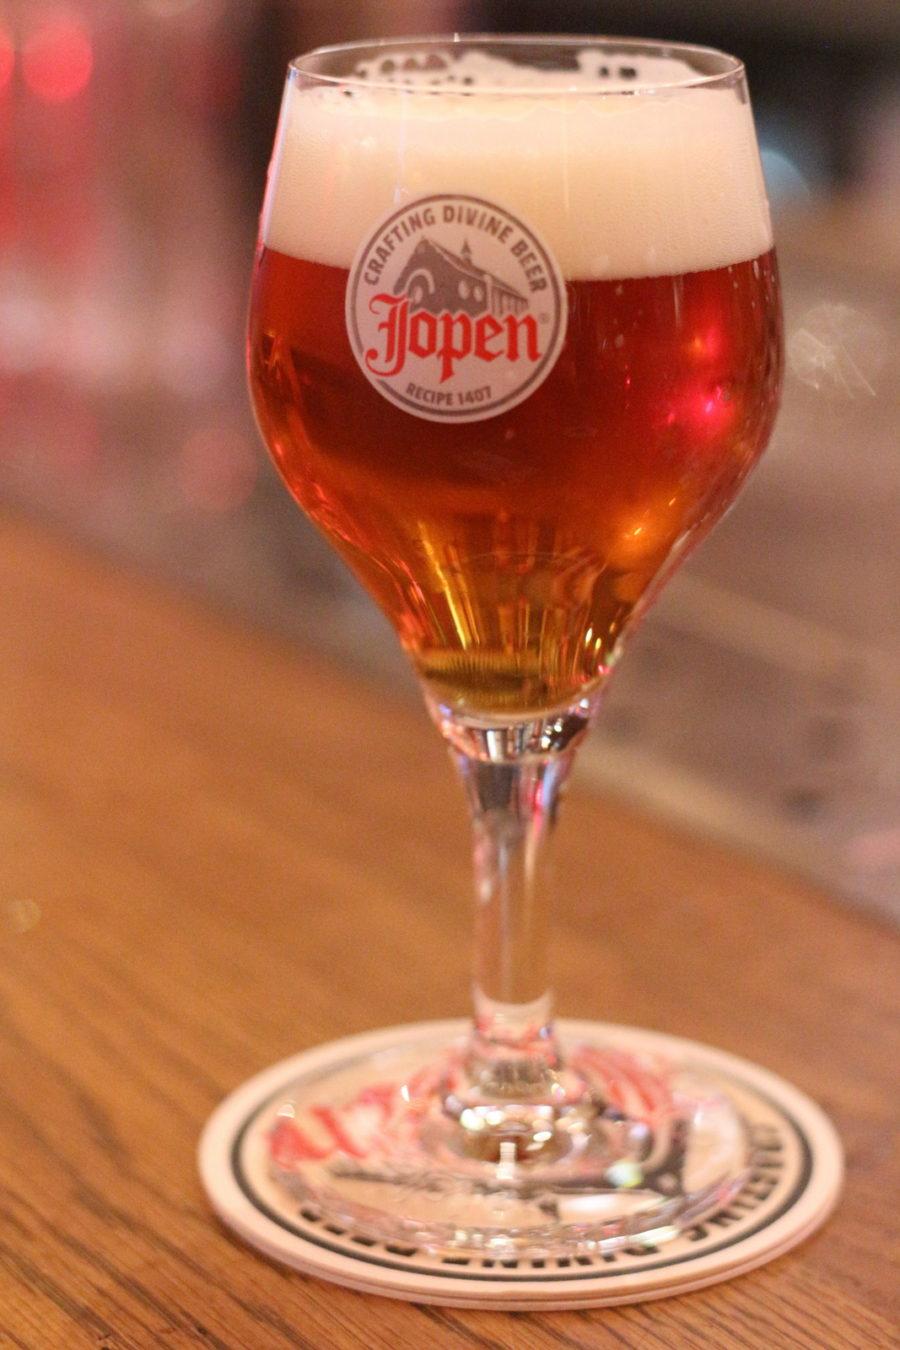 Best things to do in Haarlem at night : drink beer